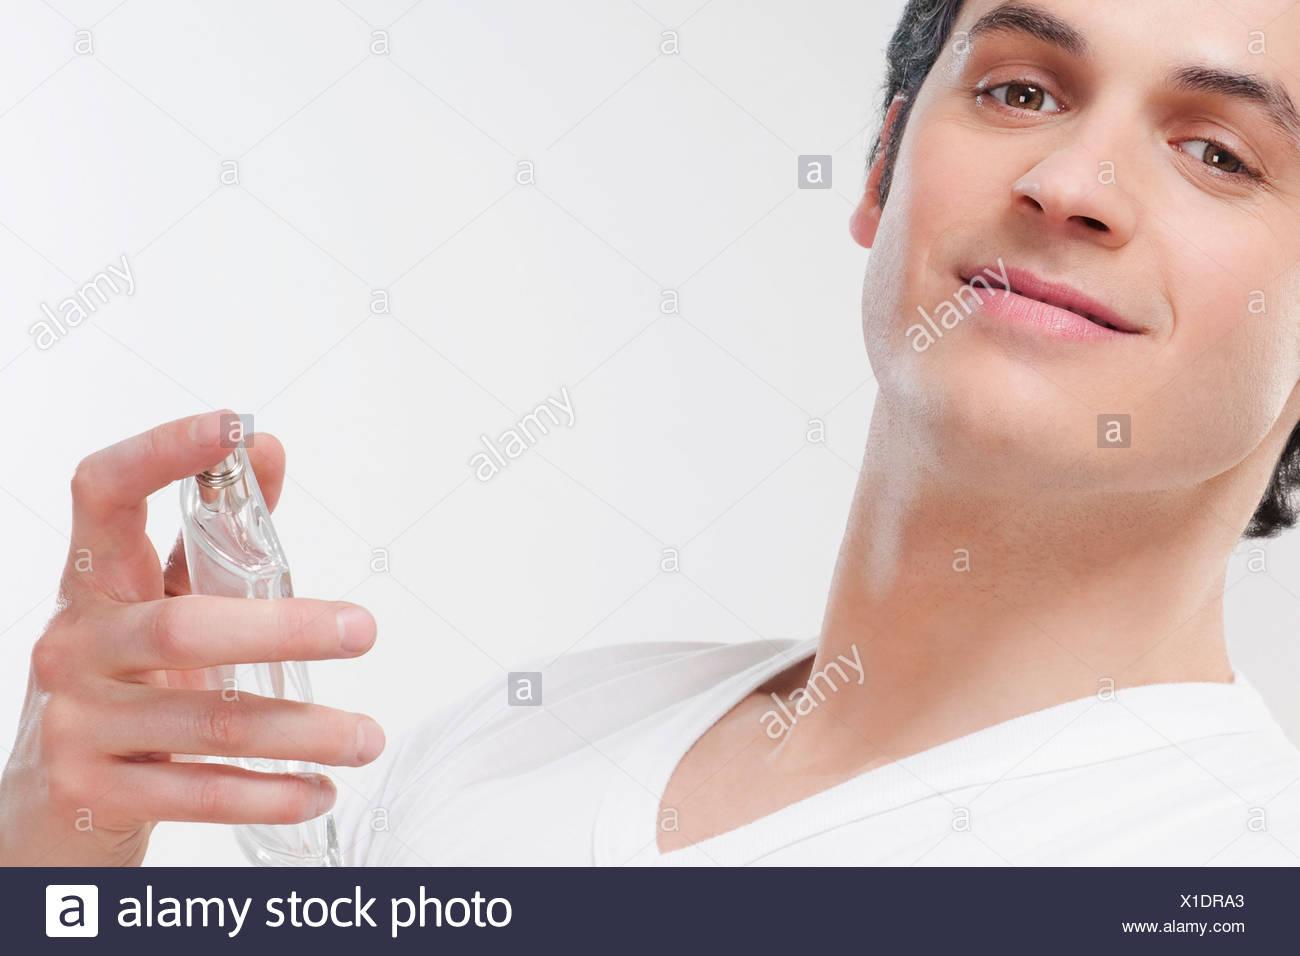 Man holding a perfume bottle - Stock Image